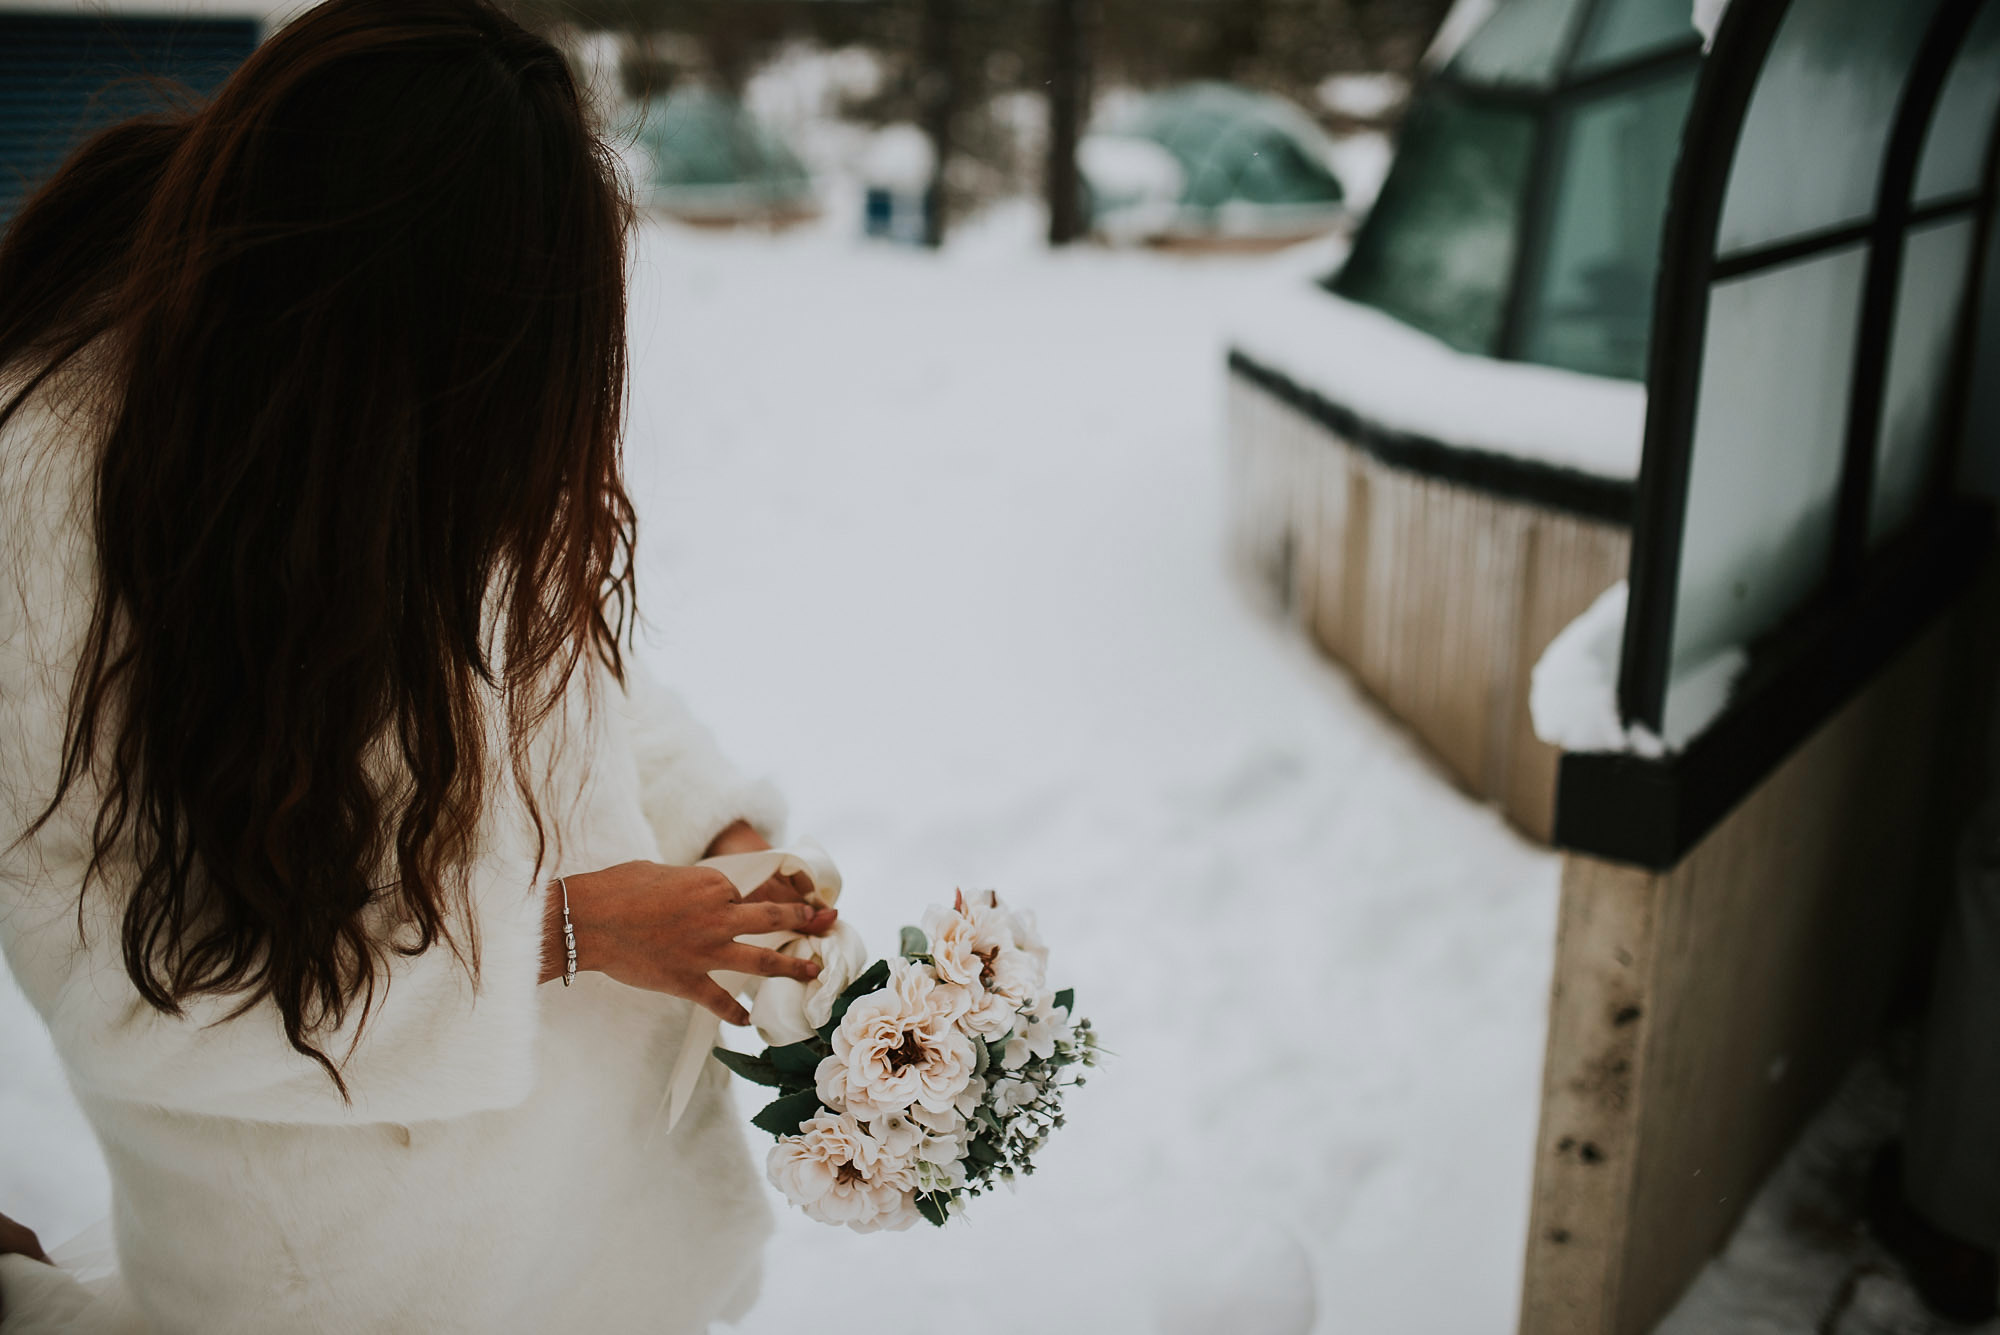 levi-ice-chapel-weddings-lapland-finland-photographer-jere-satamo-009-blog.jpg